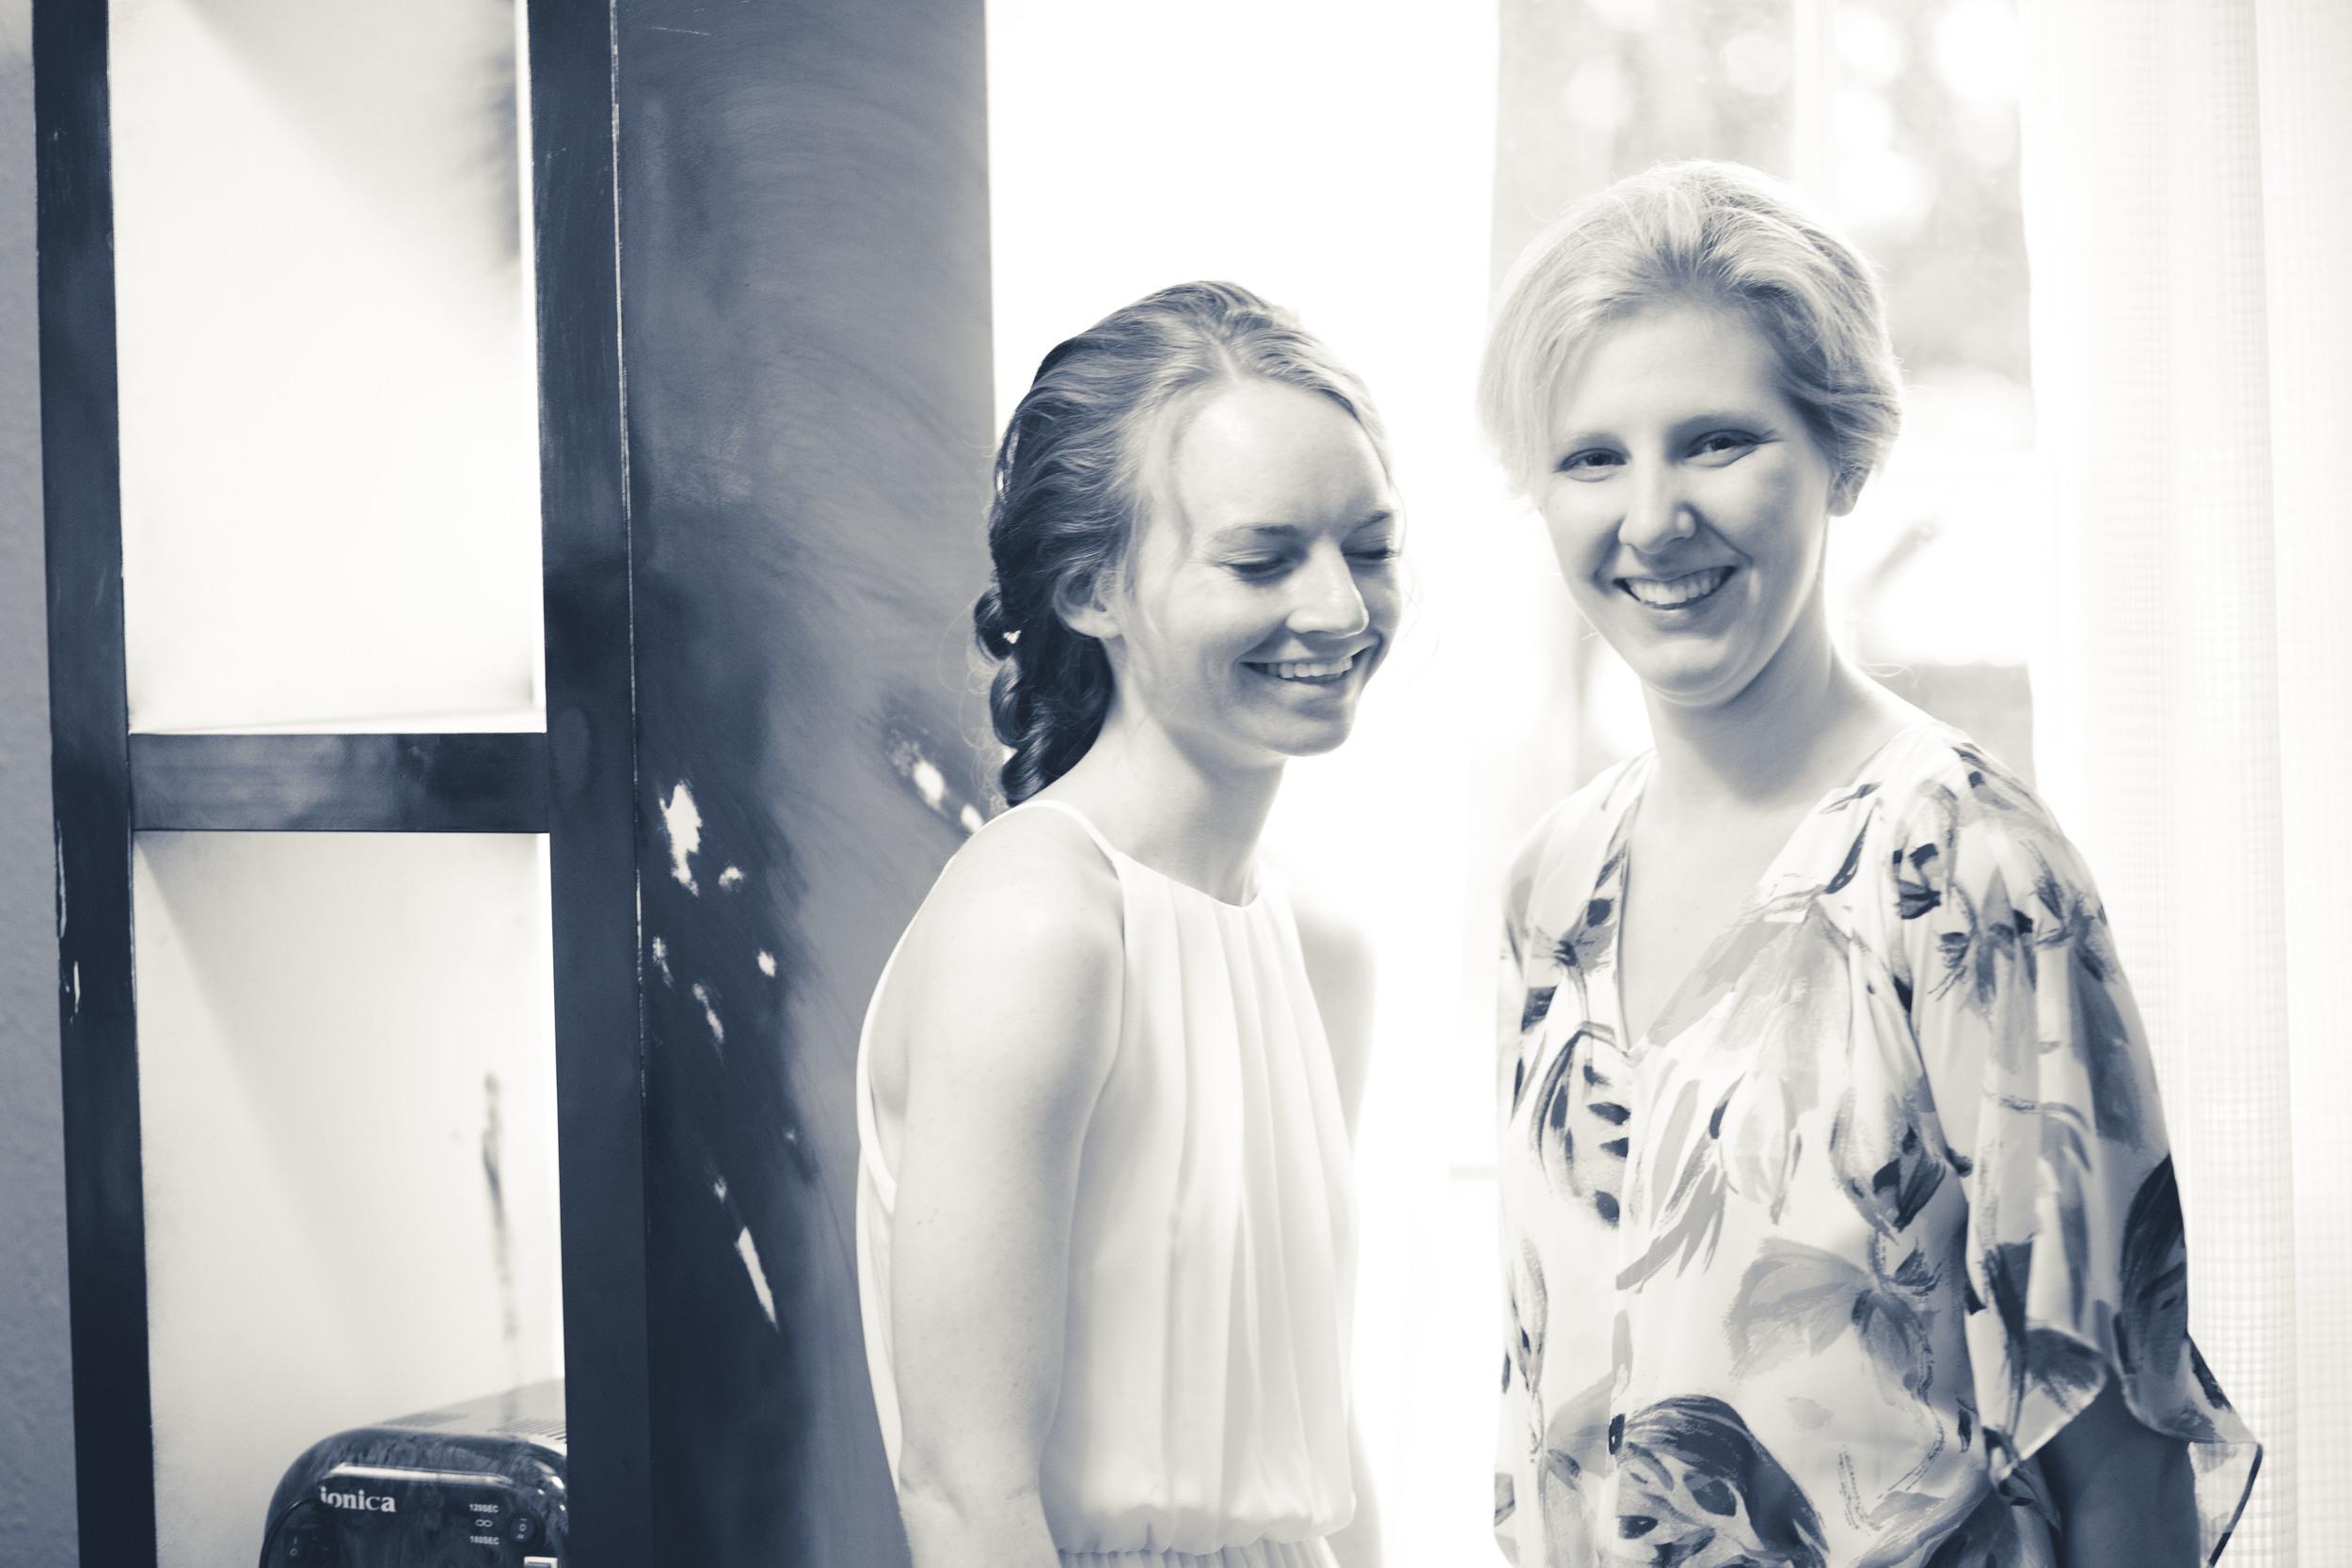 ATGI_Nicole & Patrick Wedding_2016_2S8A6165.jpg